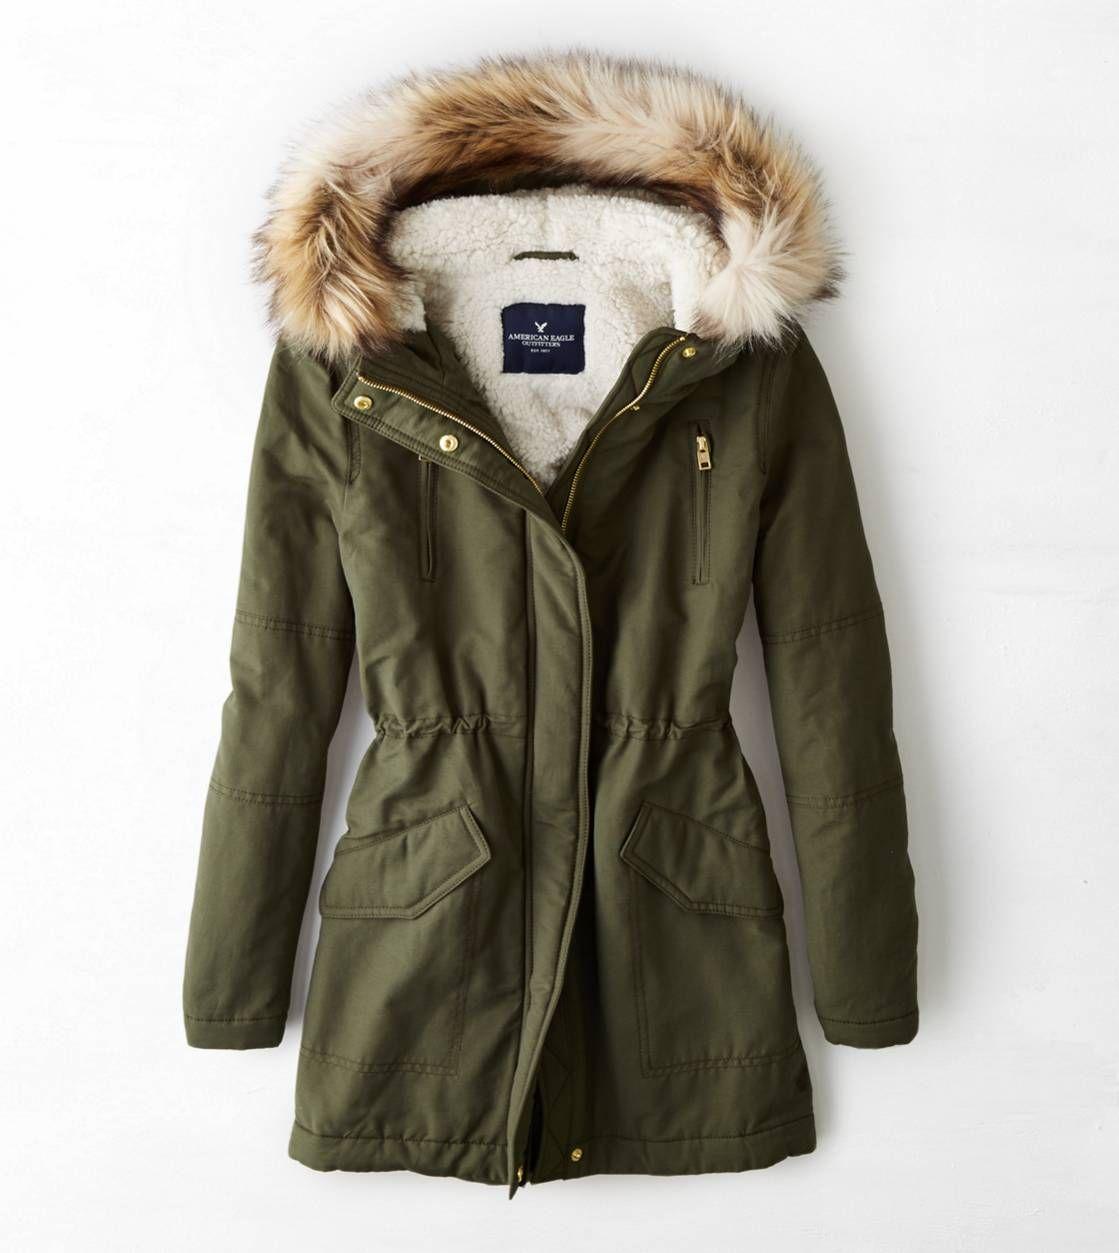 Green Parka Coat With Fur Hood